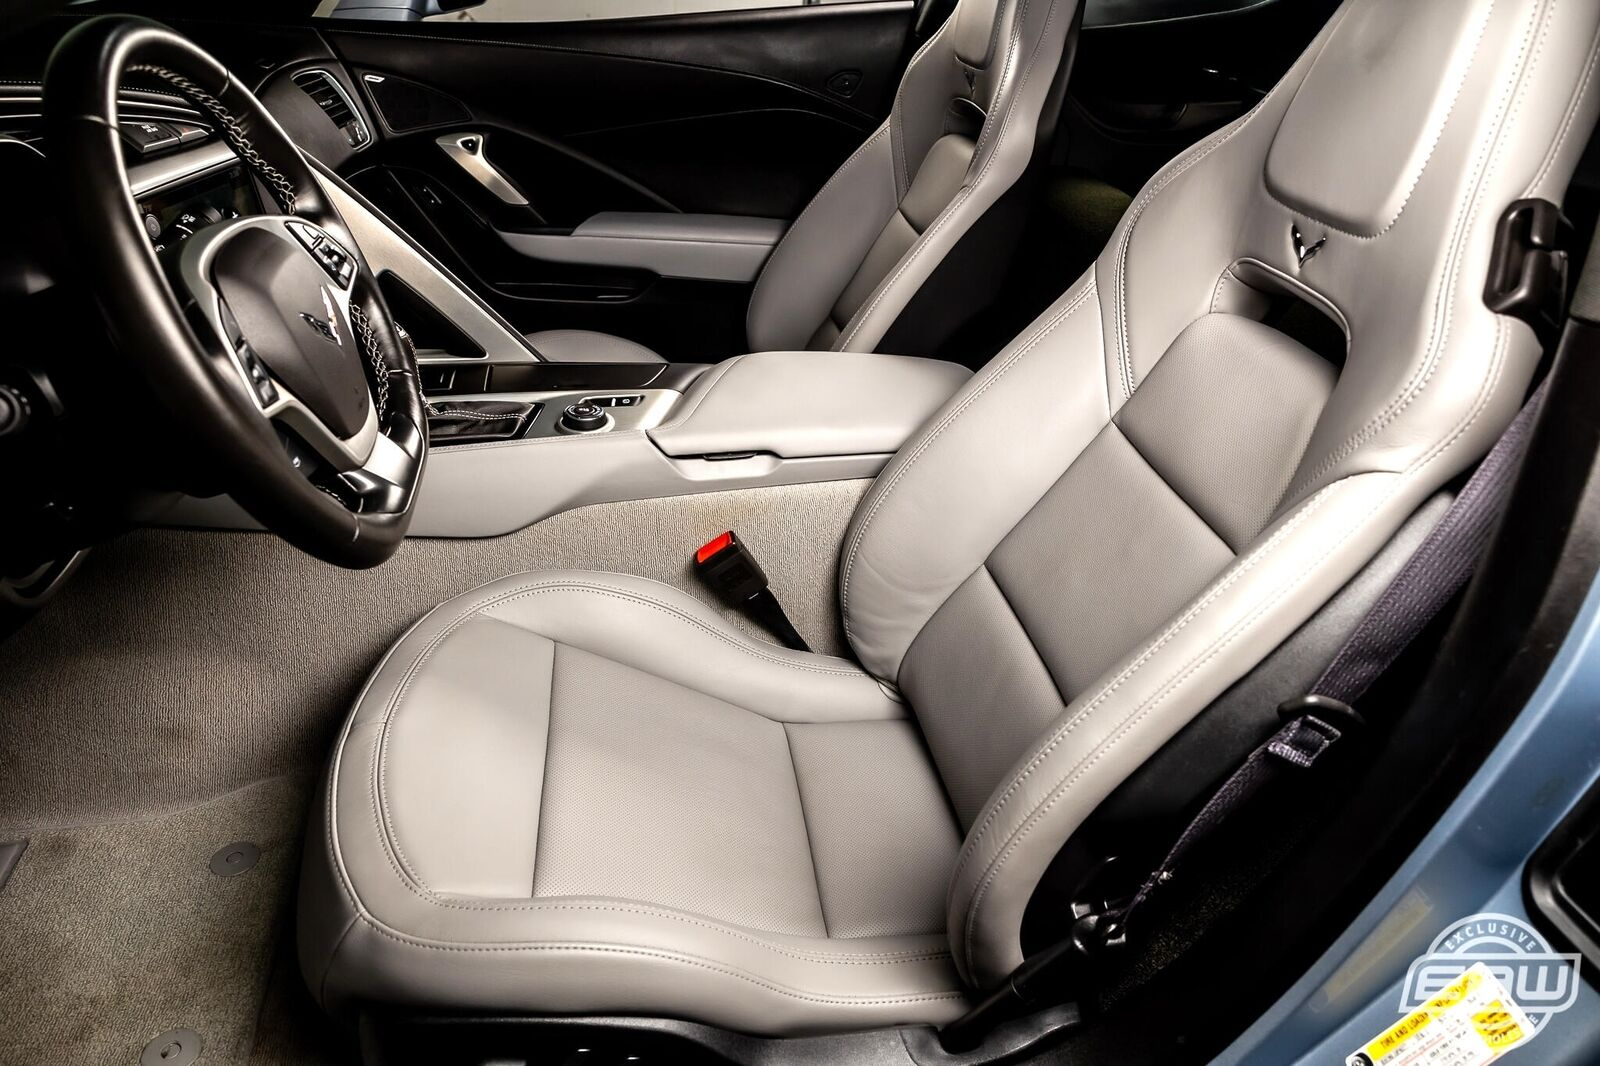 2017 Silver Chevrolet Corvette Grand Sport 2LT | C7 Corvette Photo 5